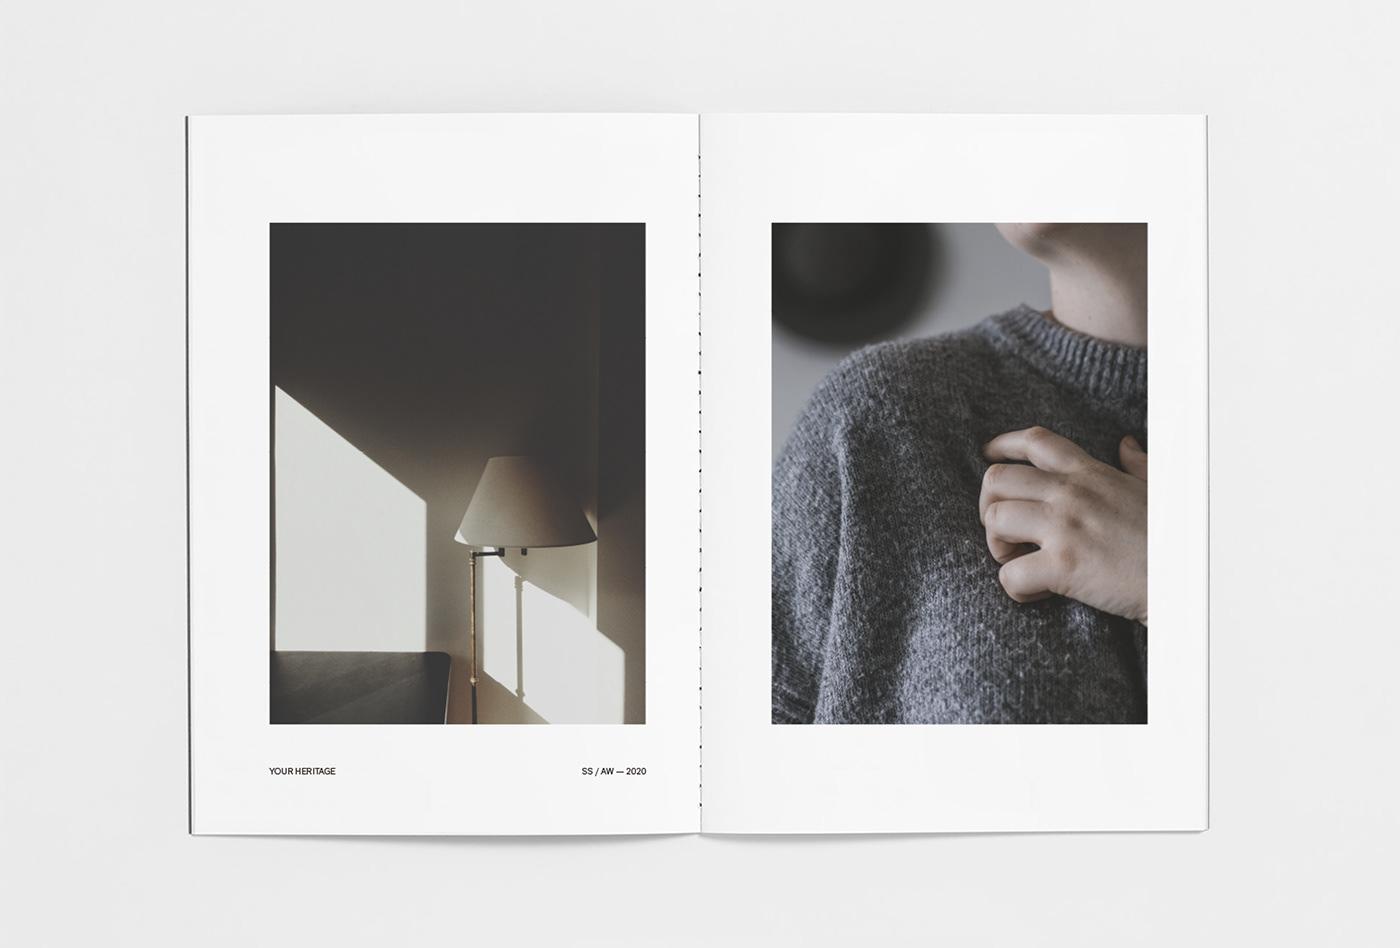 apparel brandidentity Clothing design Fashion  graphicdesign identitydesign Minimalism slowfashion typography